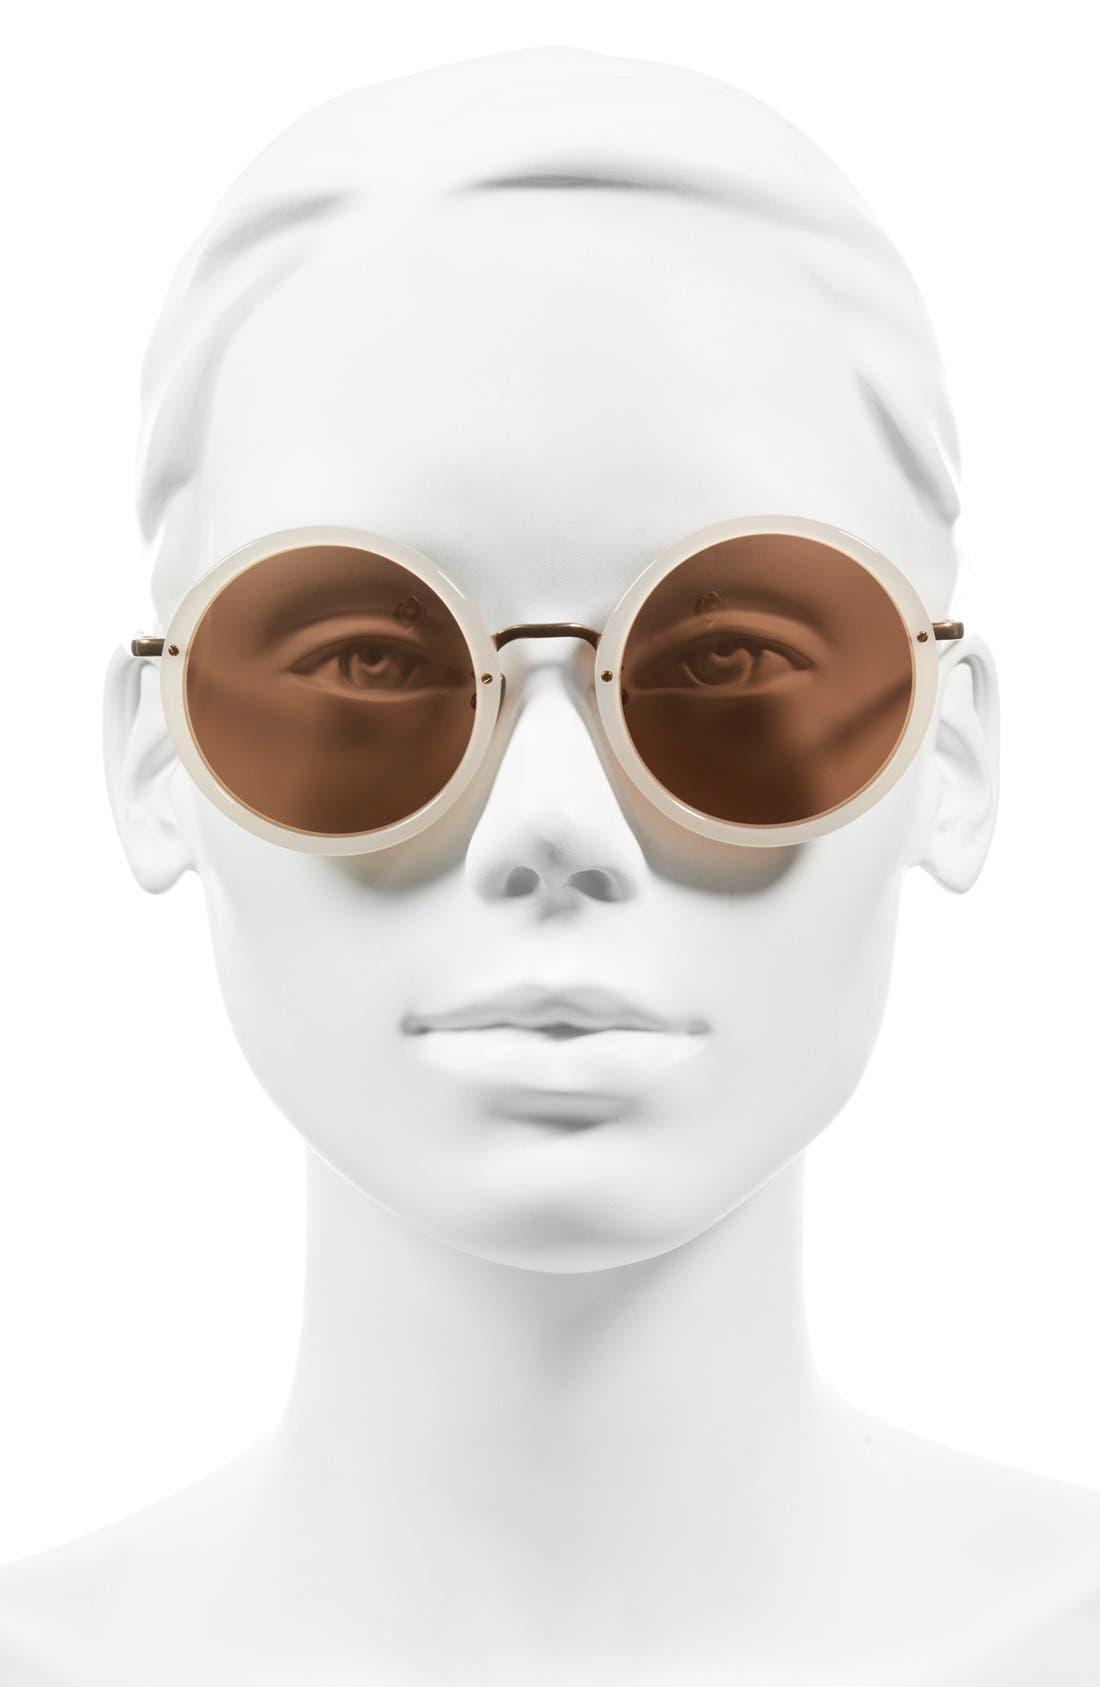 51mm Round 18 Karat Rose Gold Trim Sunglasses,                             Alternate thumbnail 2, color,                             680